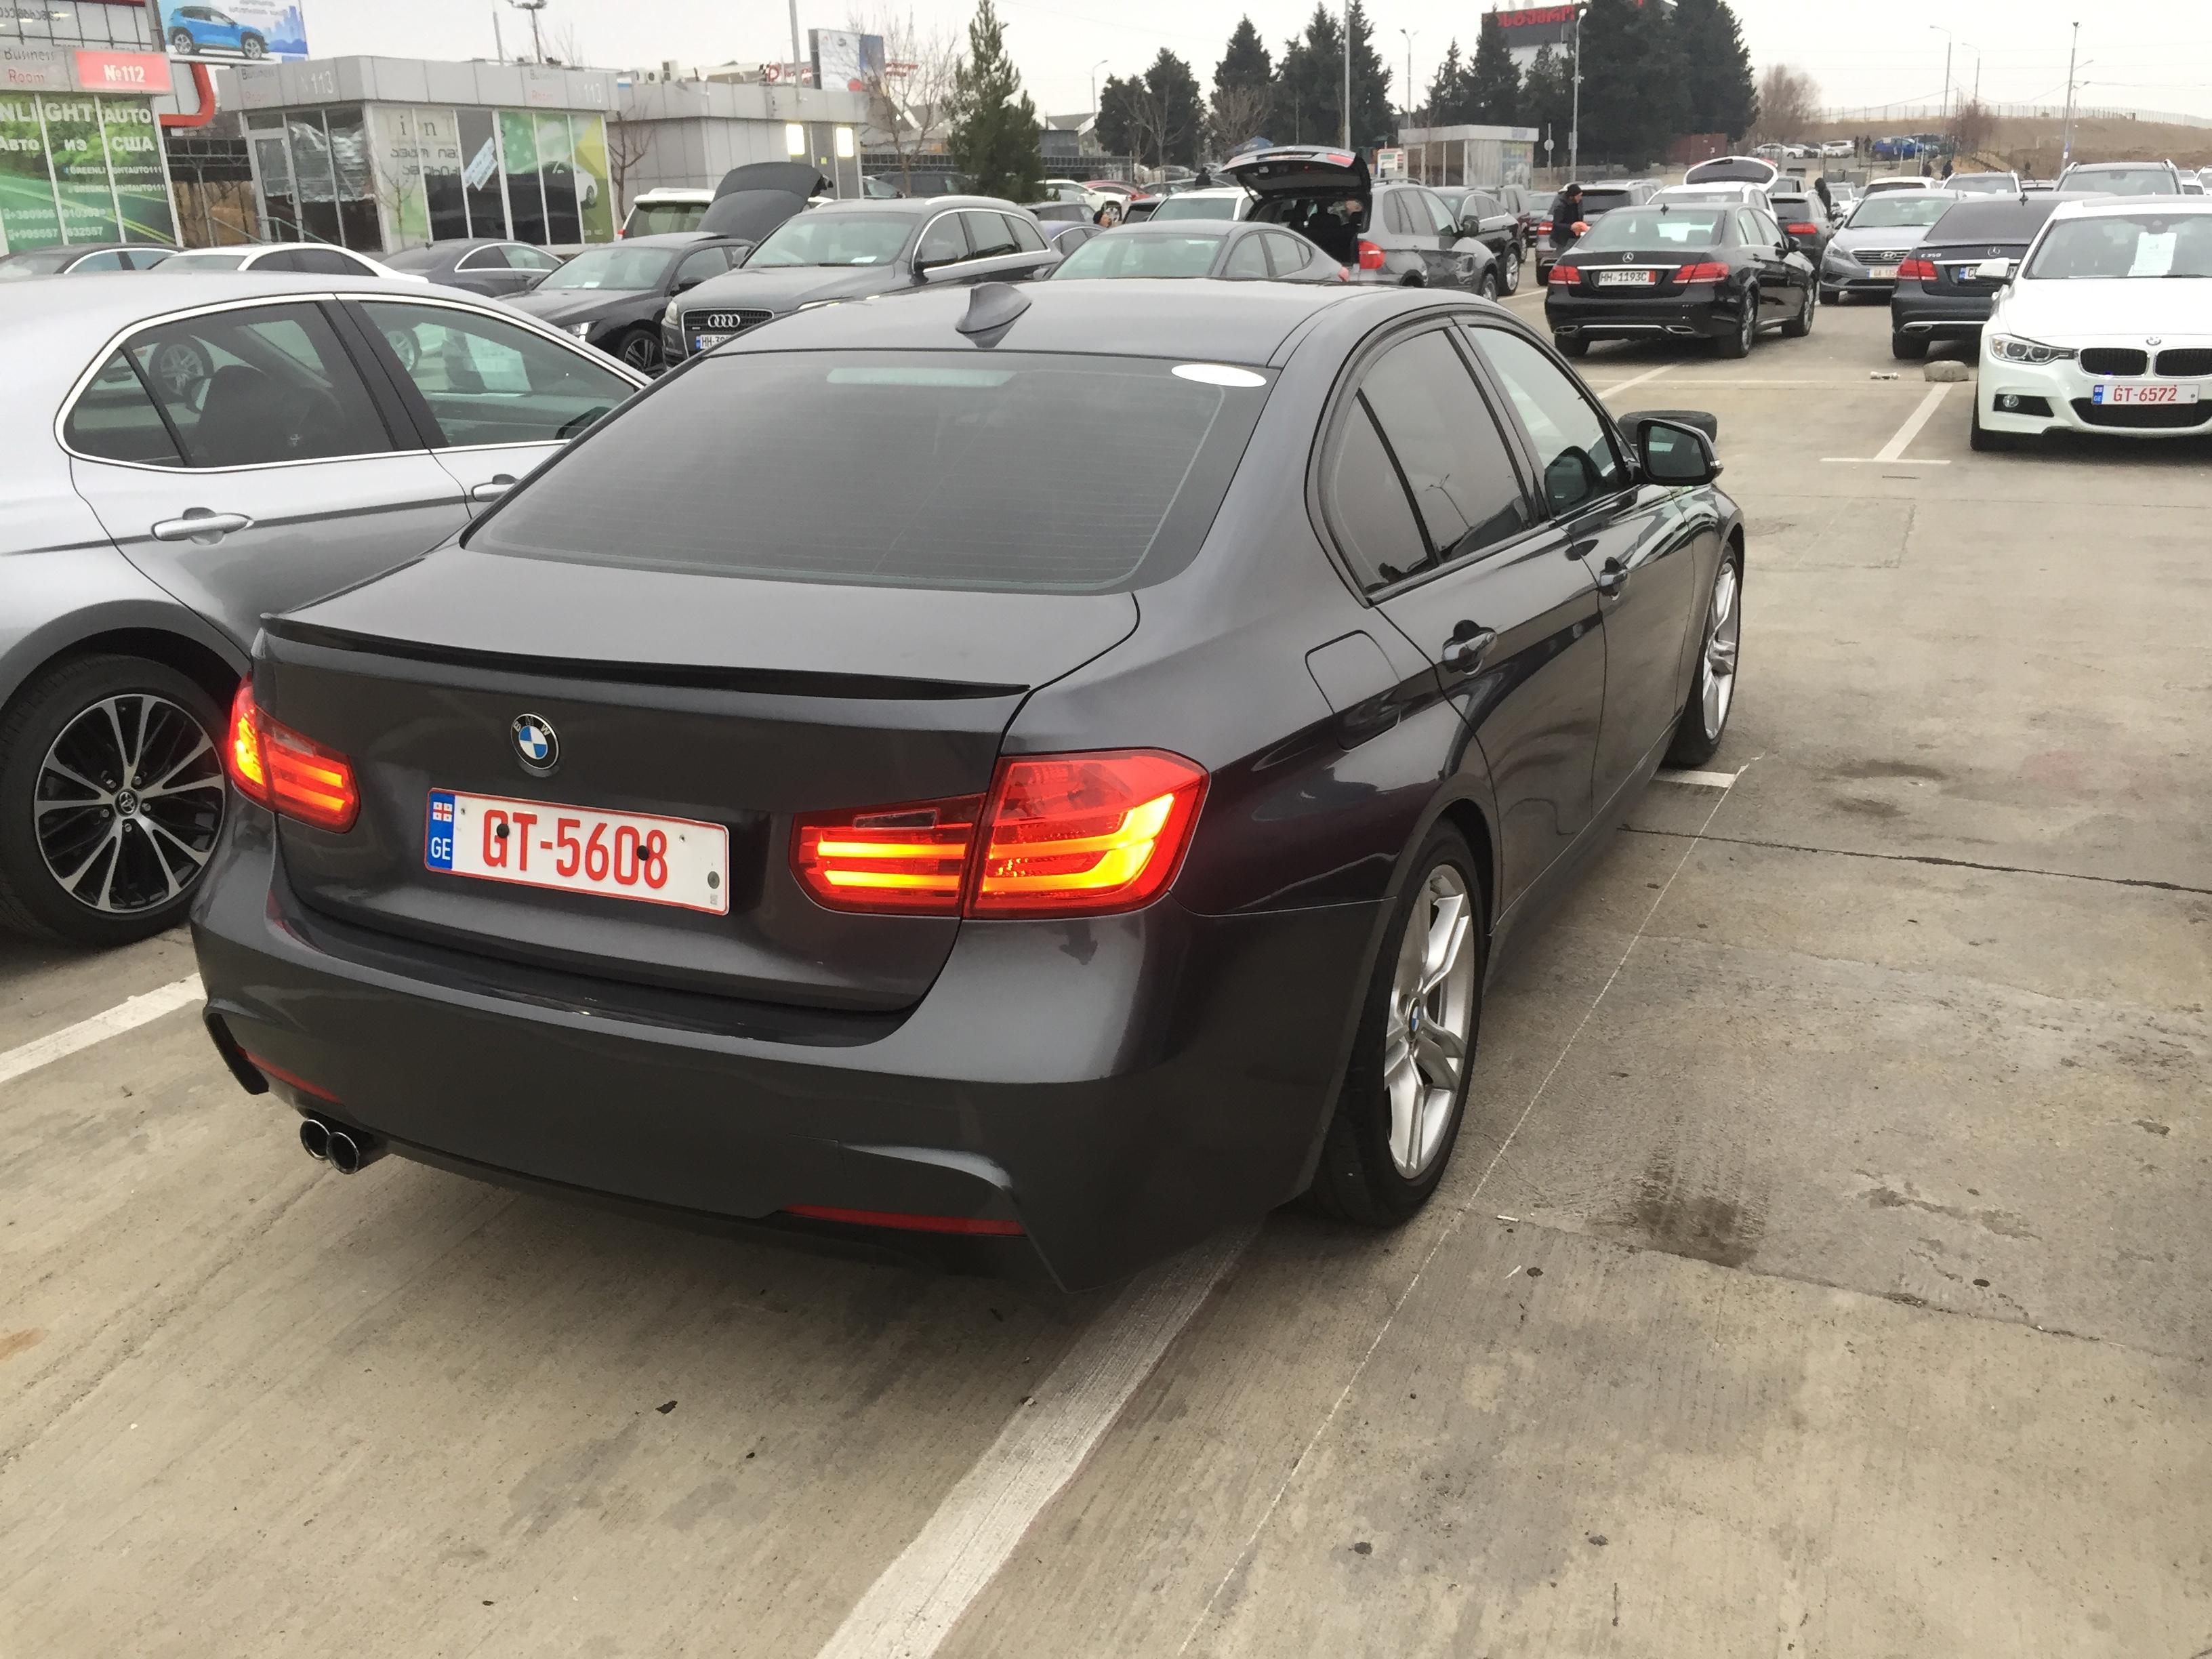 BMW 328 2.0(lt) 2013 Second hand  $11900